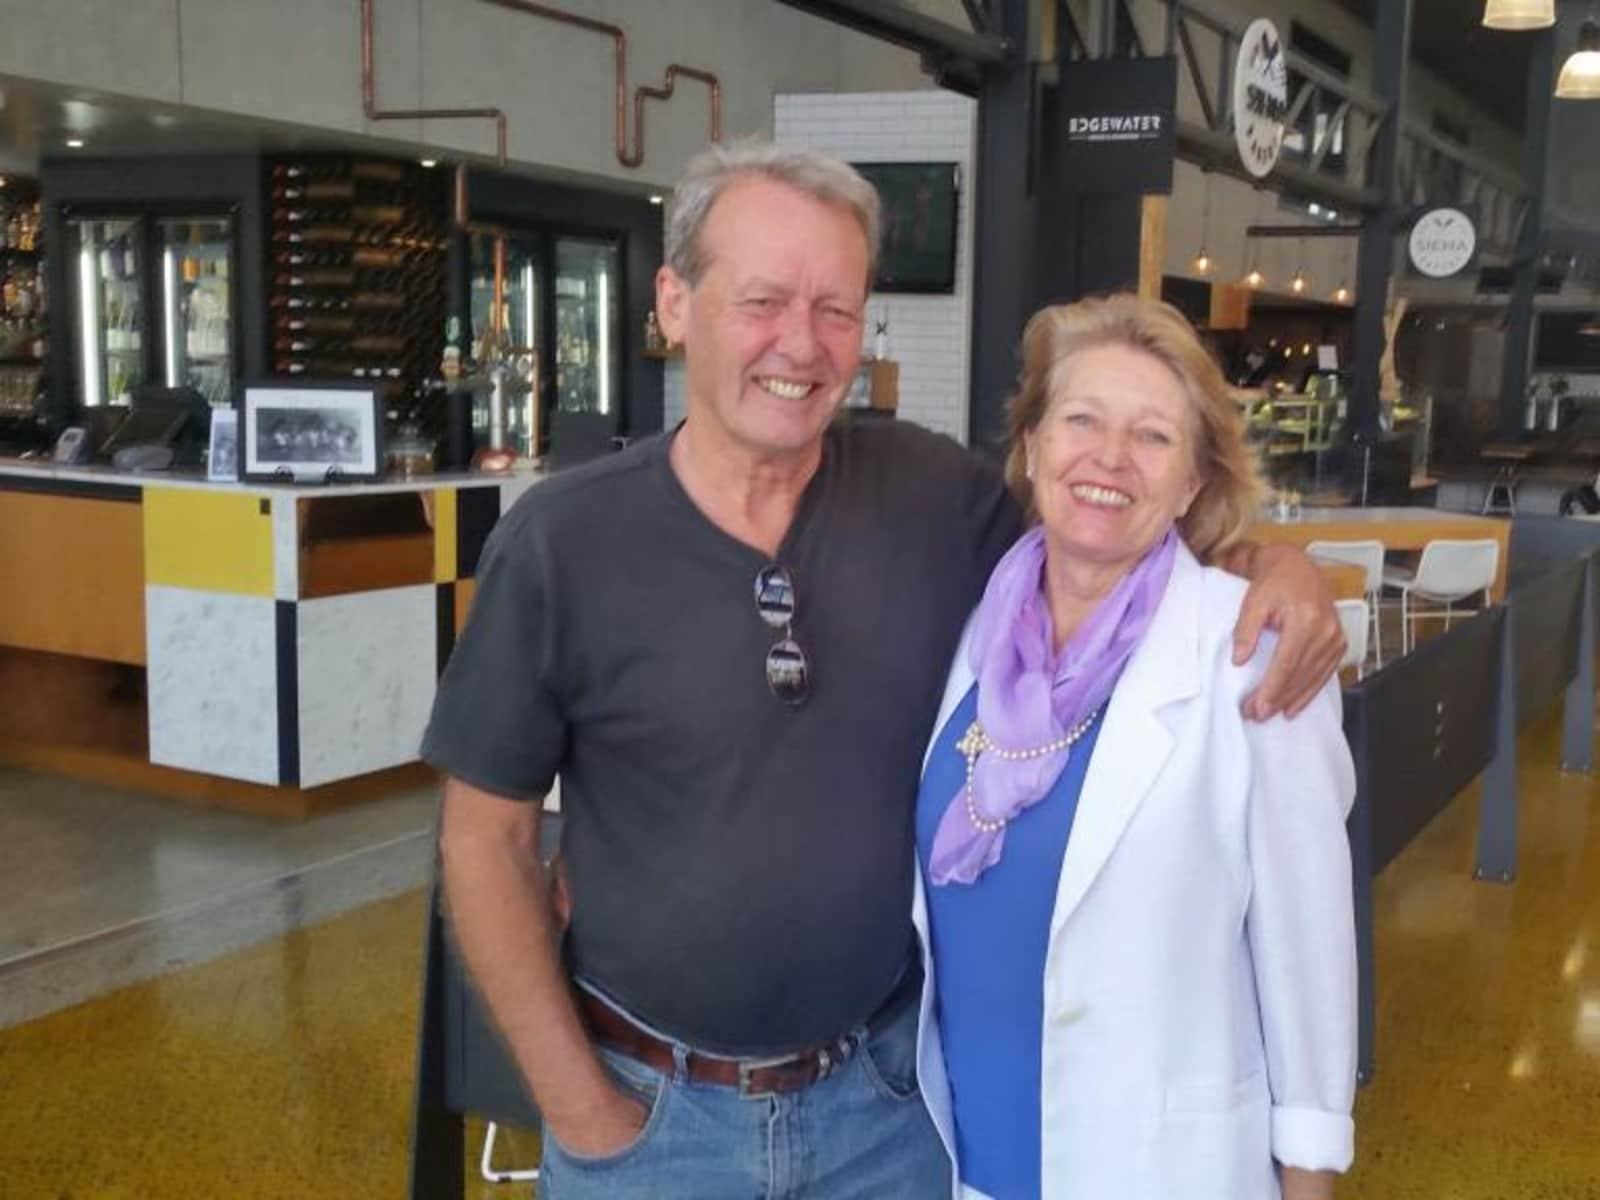 Christian & Hannele from Gold Coast, Queensland, Australia